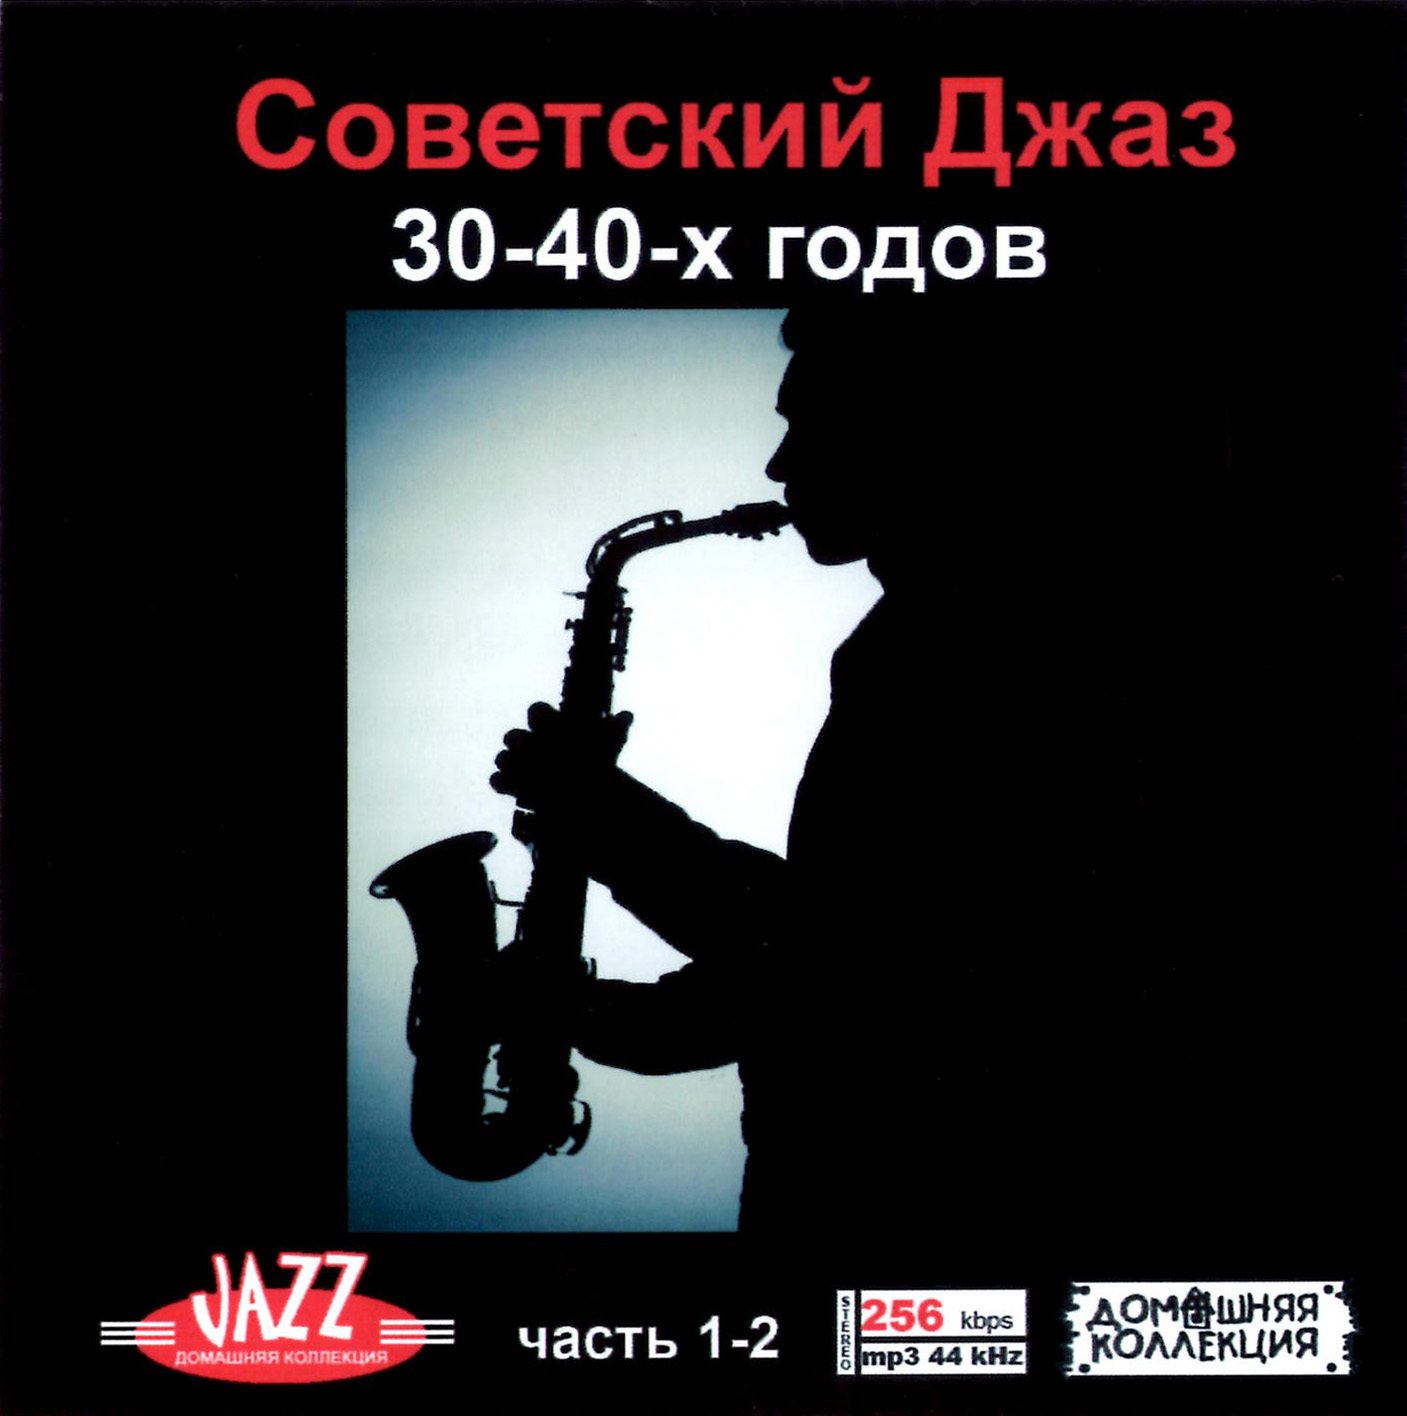 Советский джаз 30-40х годов 2cd [mp3]